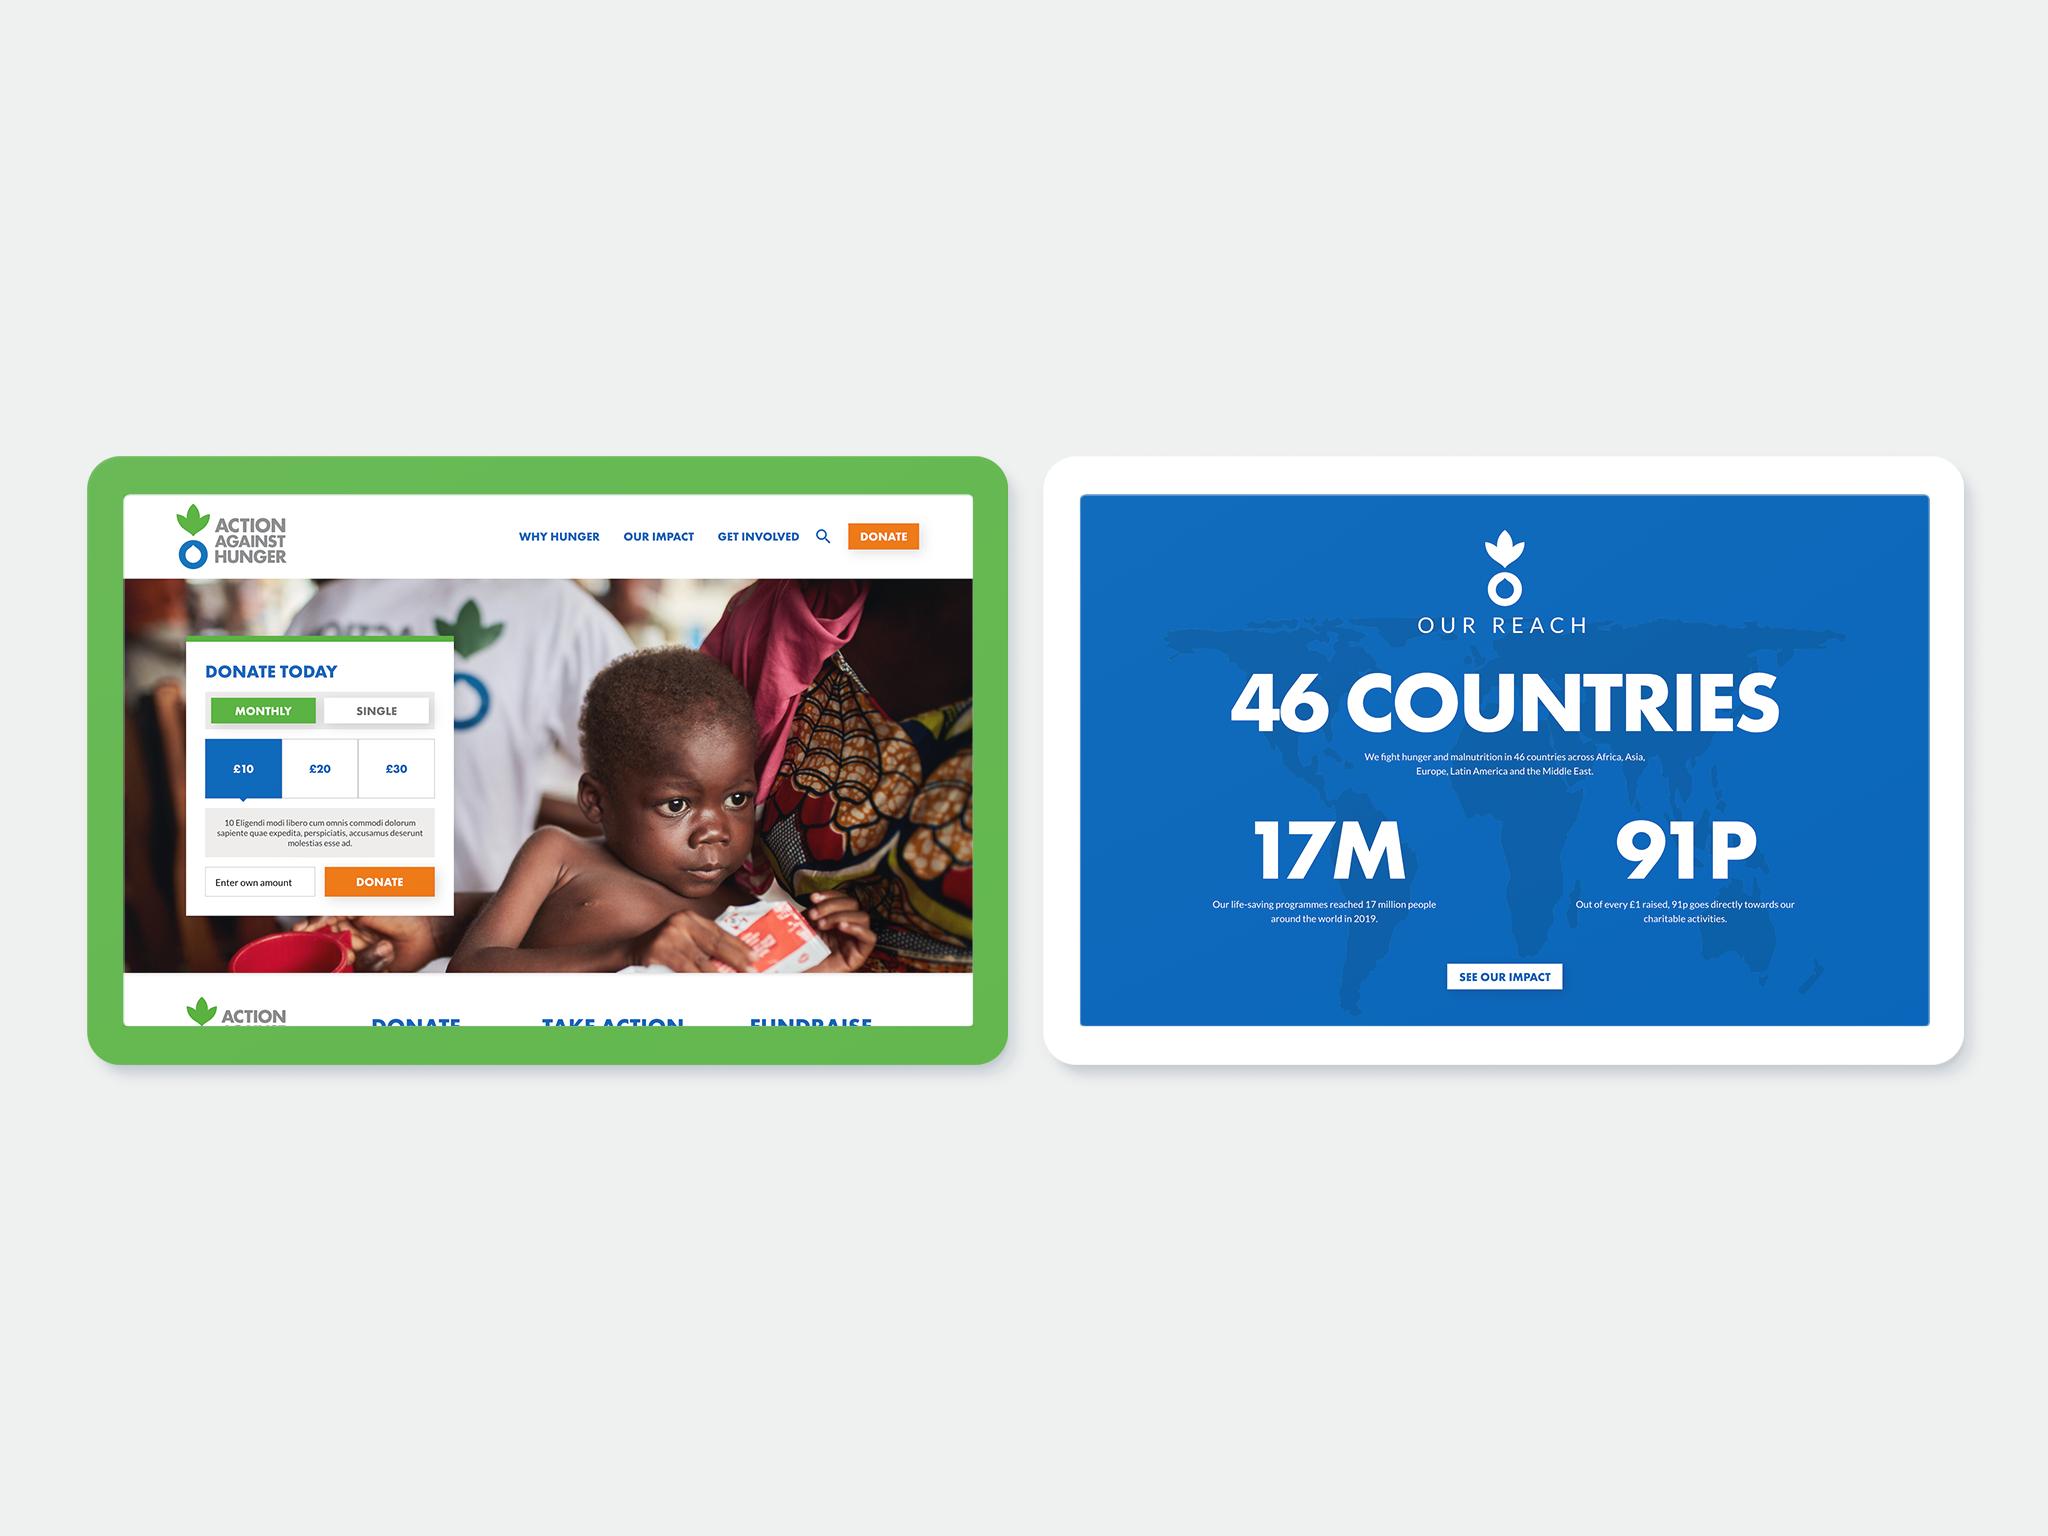 Action Against Hunger website design on two tablets